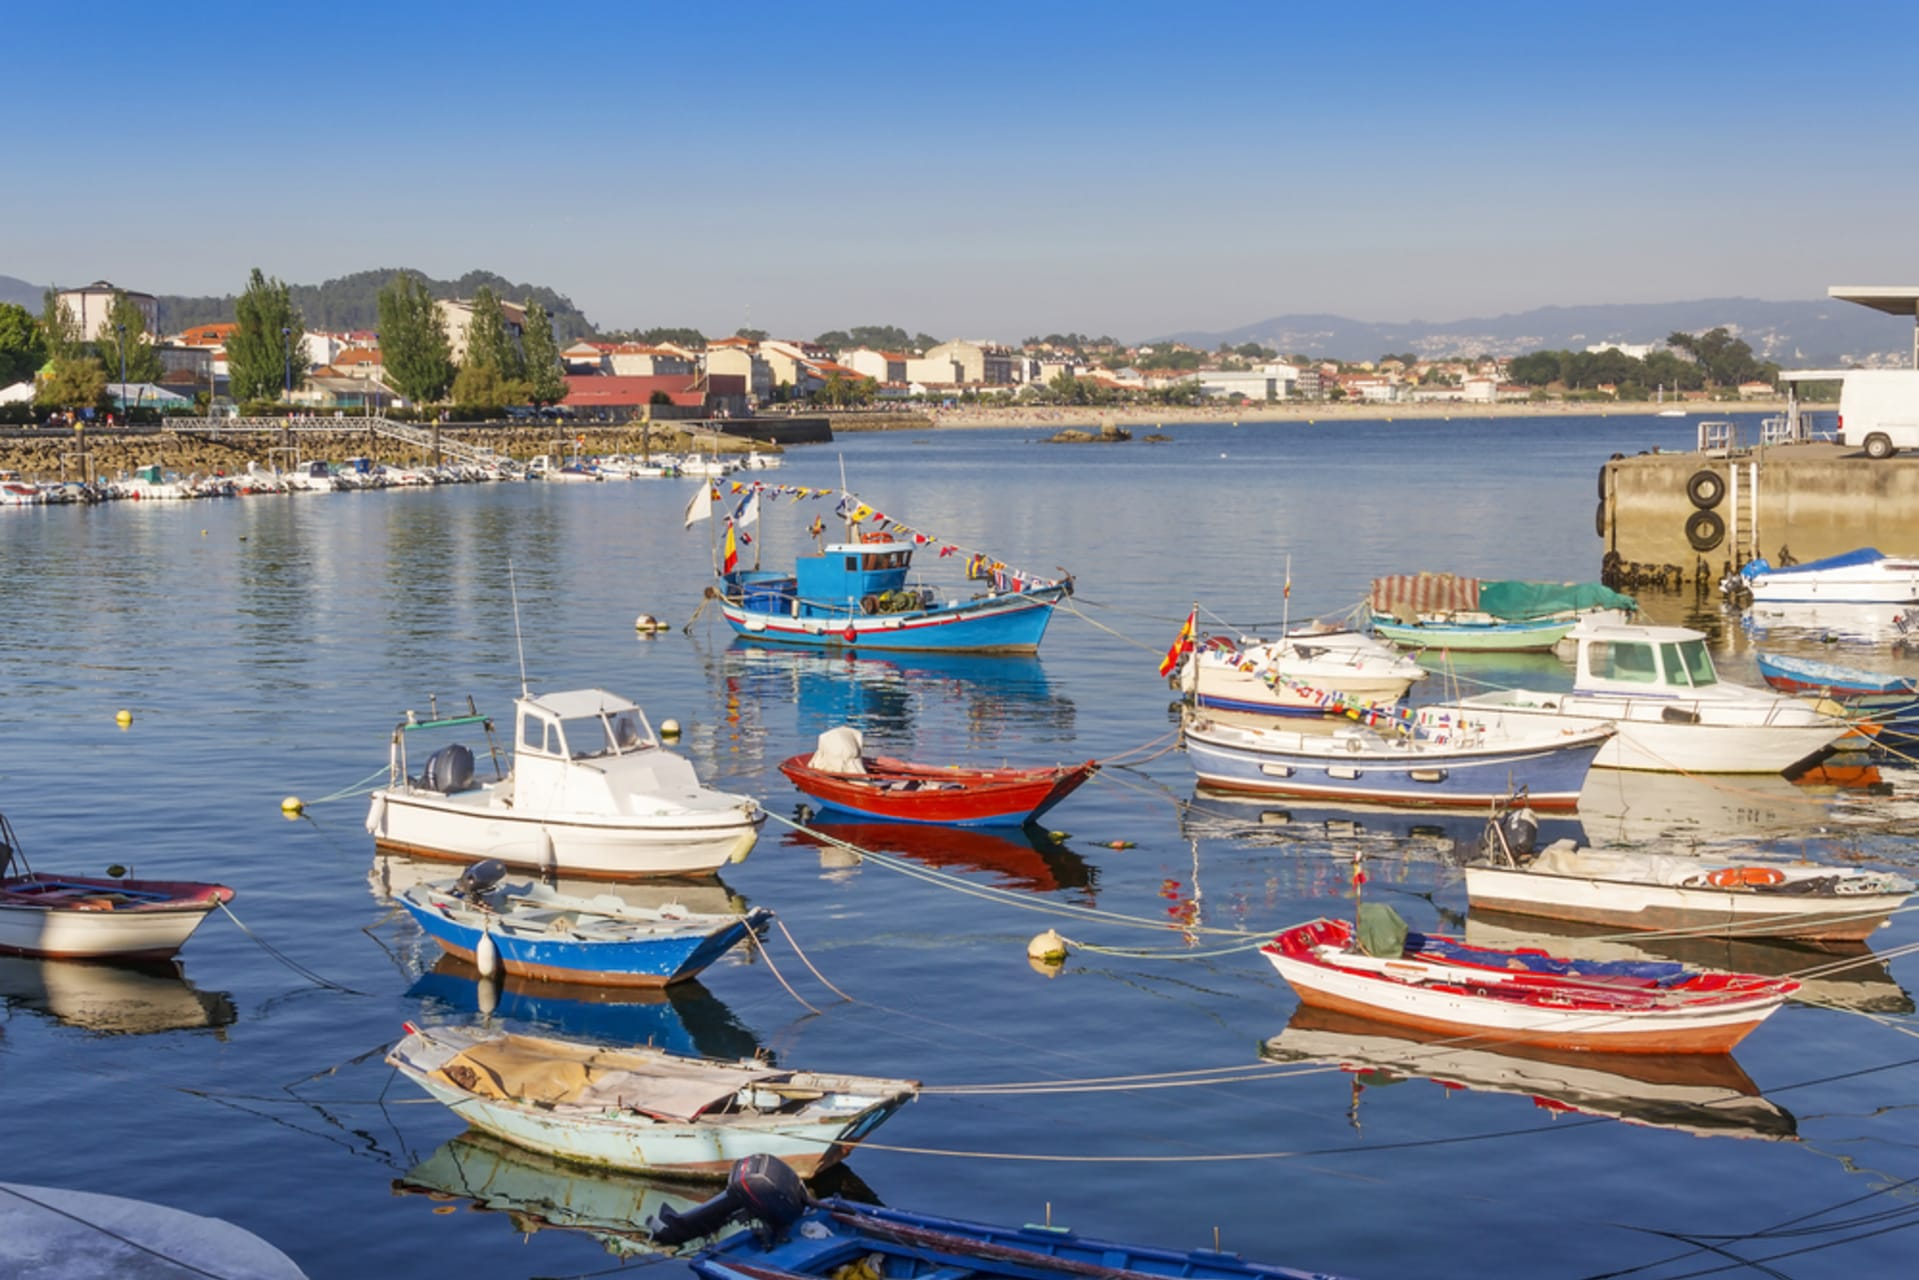 Galicia - A Walk through the Fishing village of Cangas do Morrazo